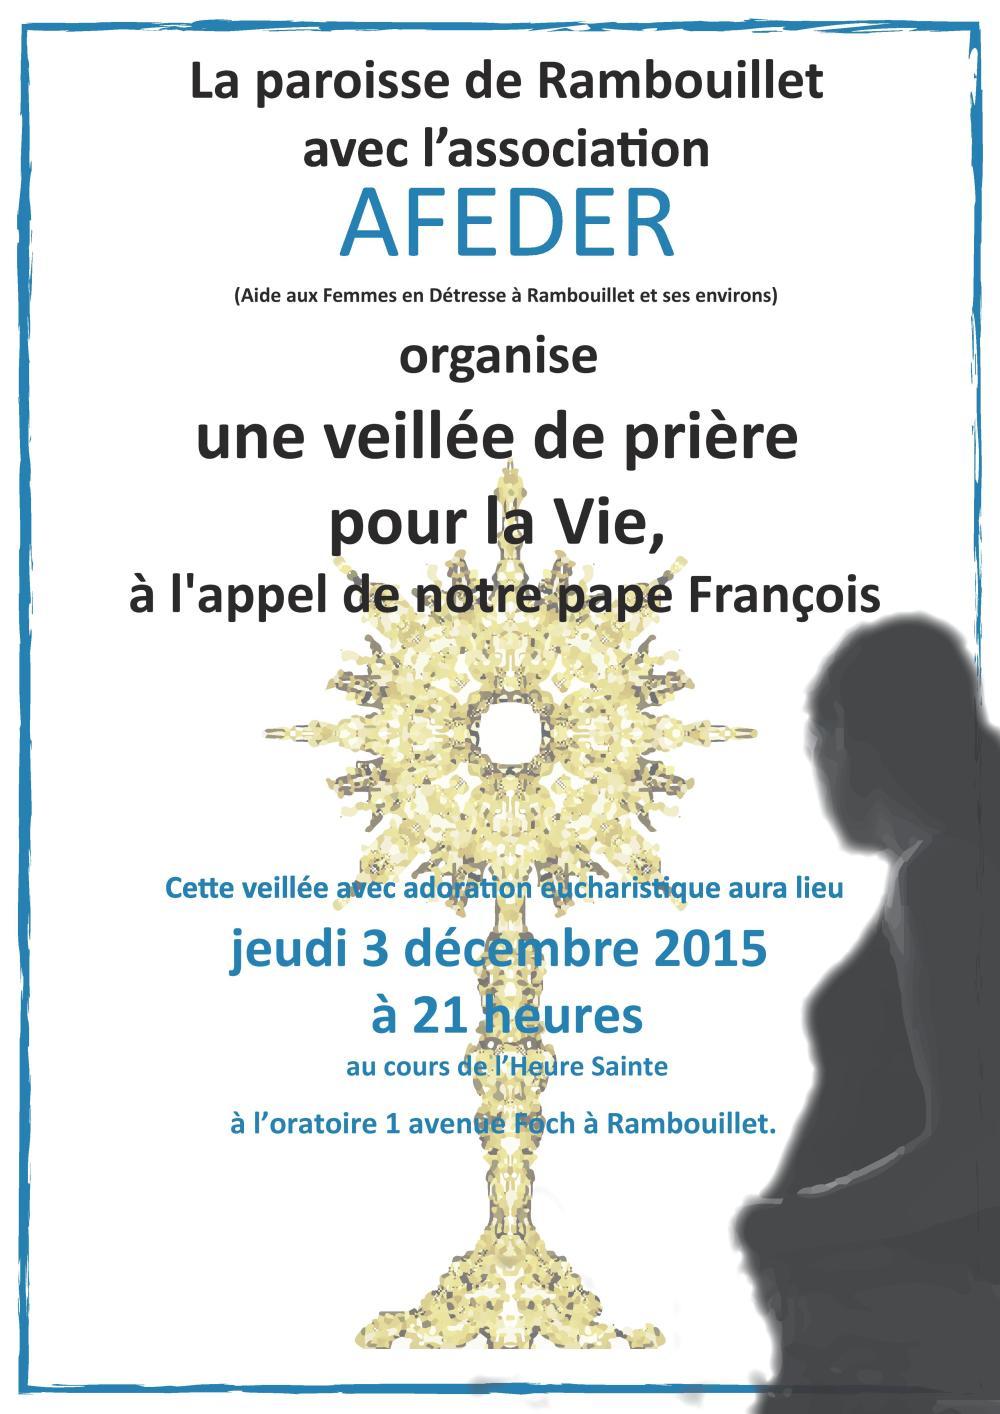 affiche veillee priere_2015 v2-page-001